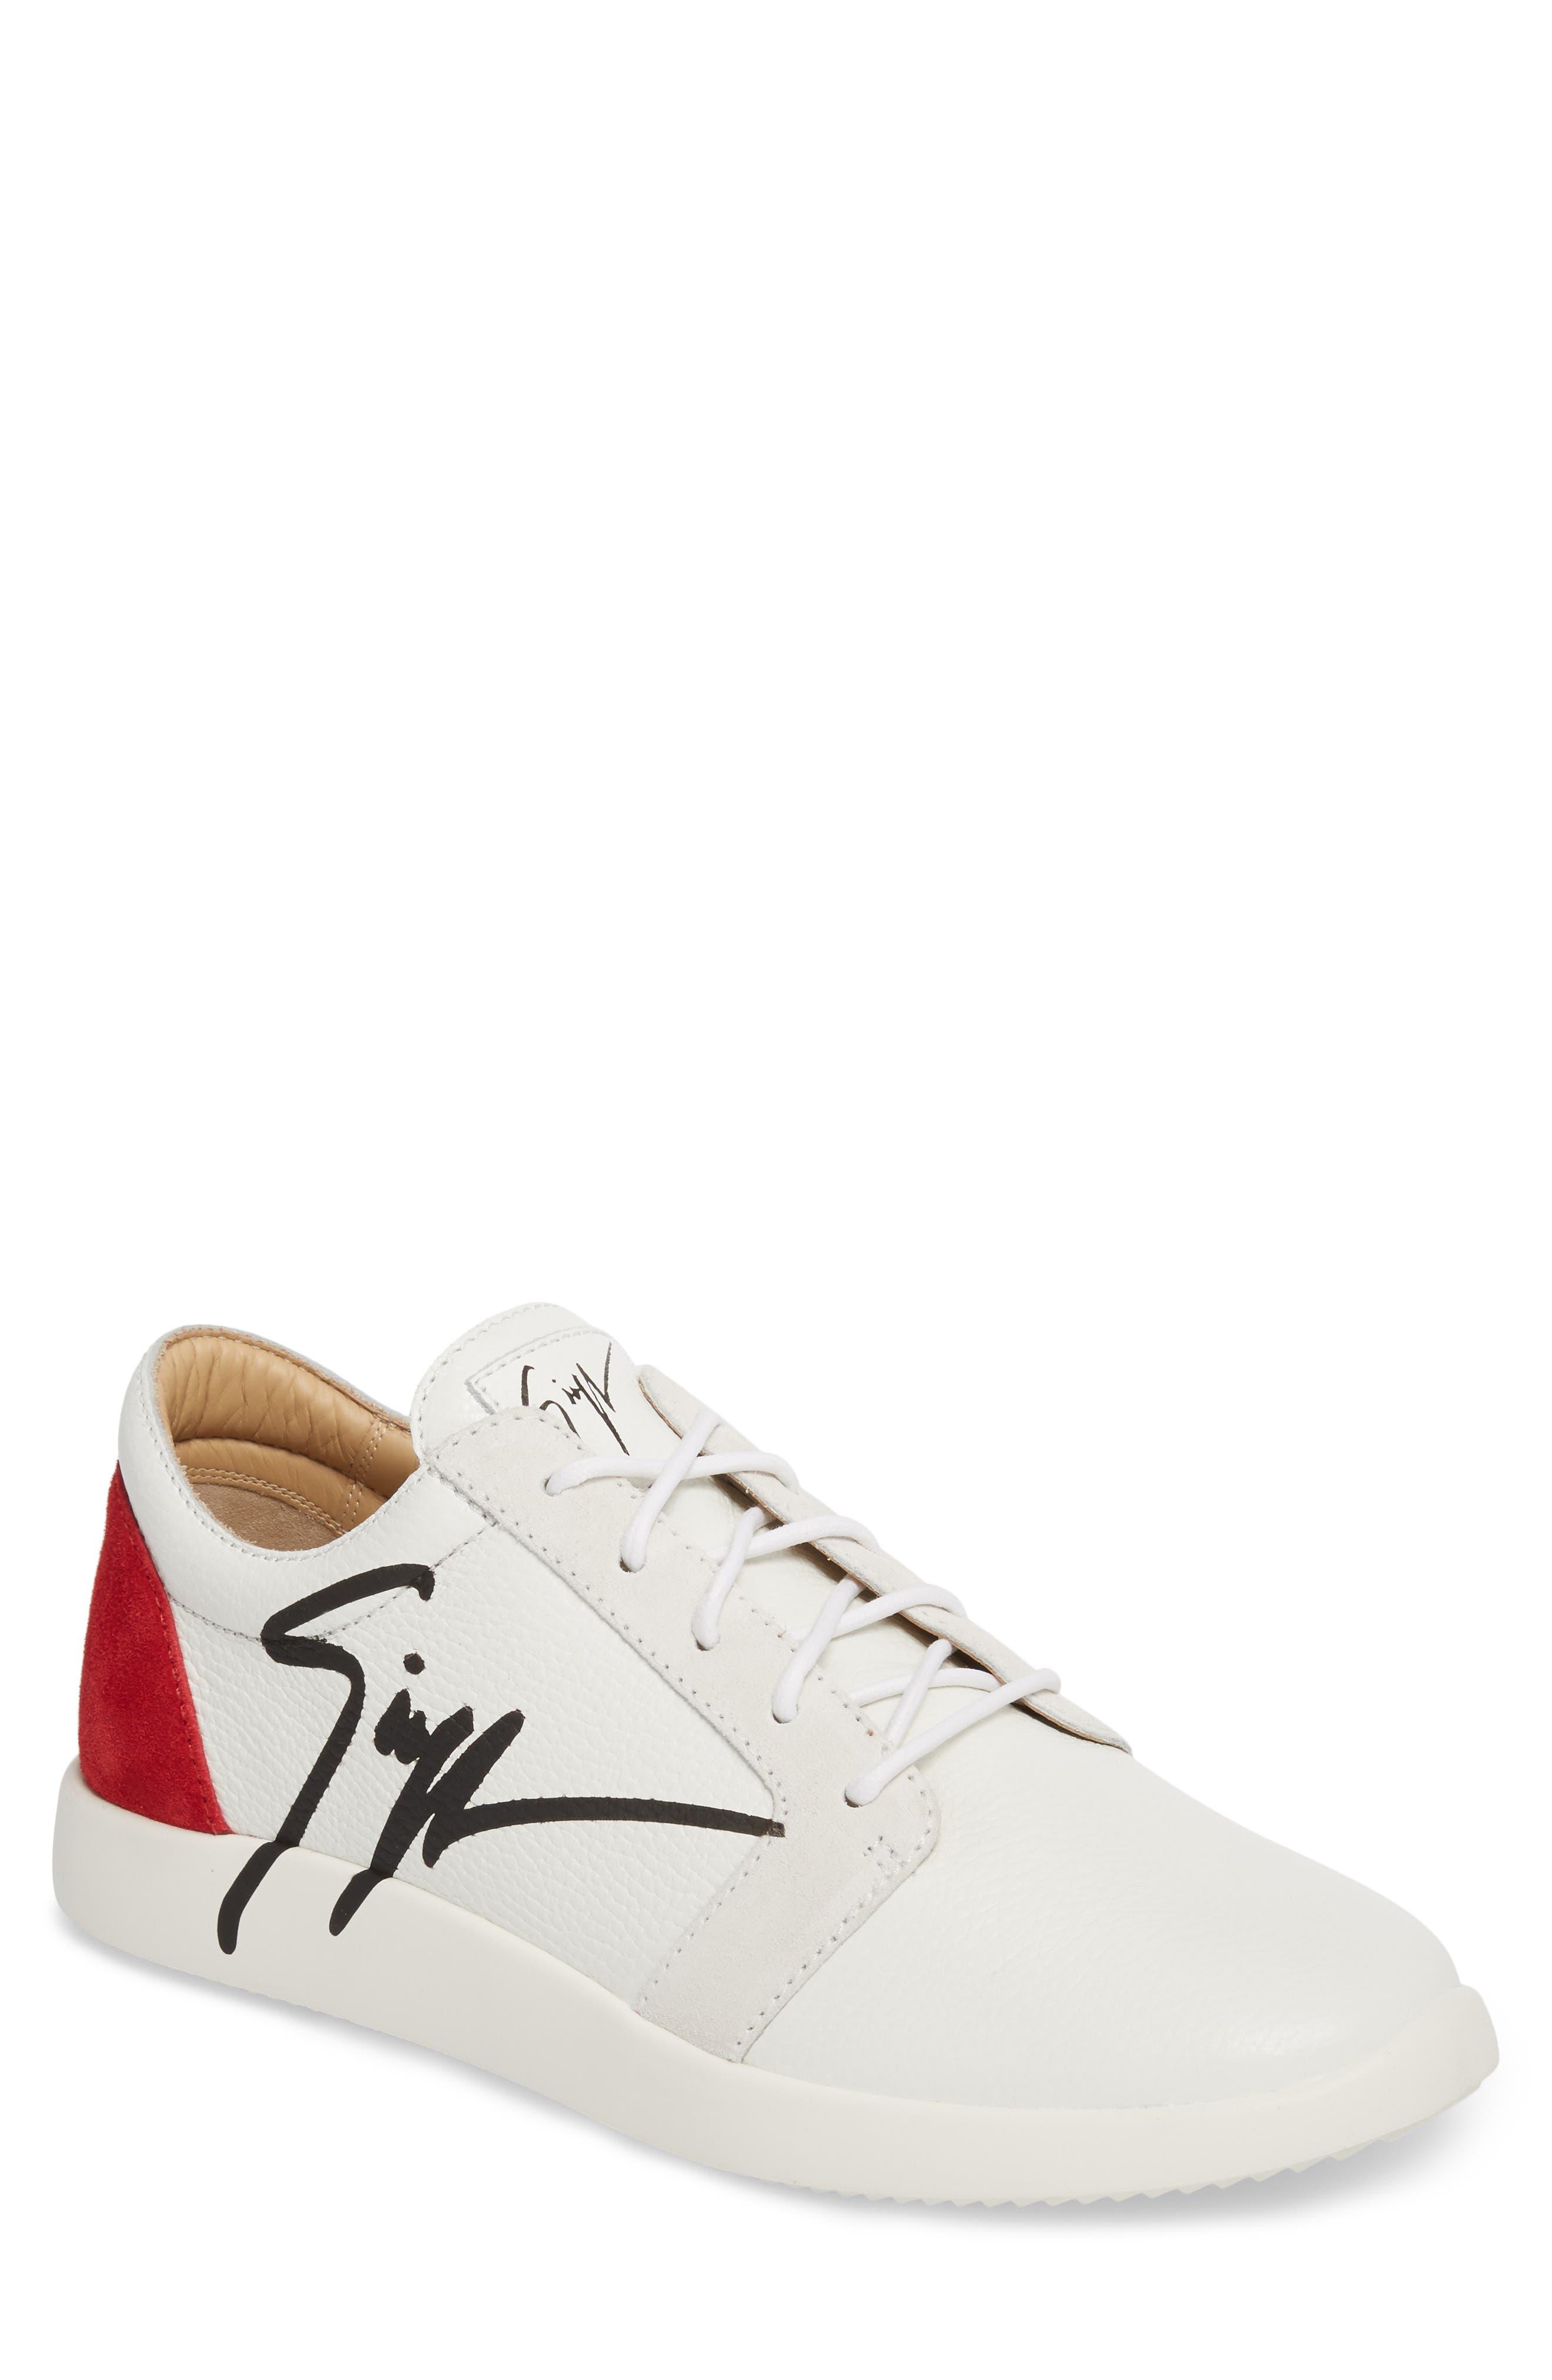 Signature Sneaker,                         Main,                         color, 124